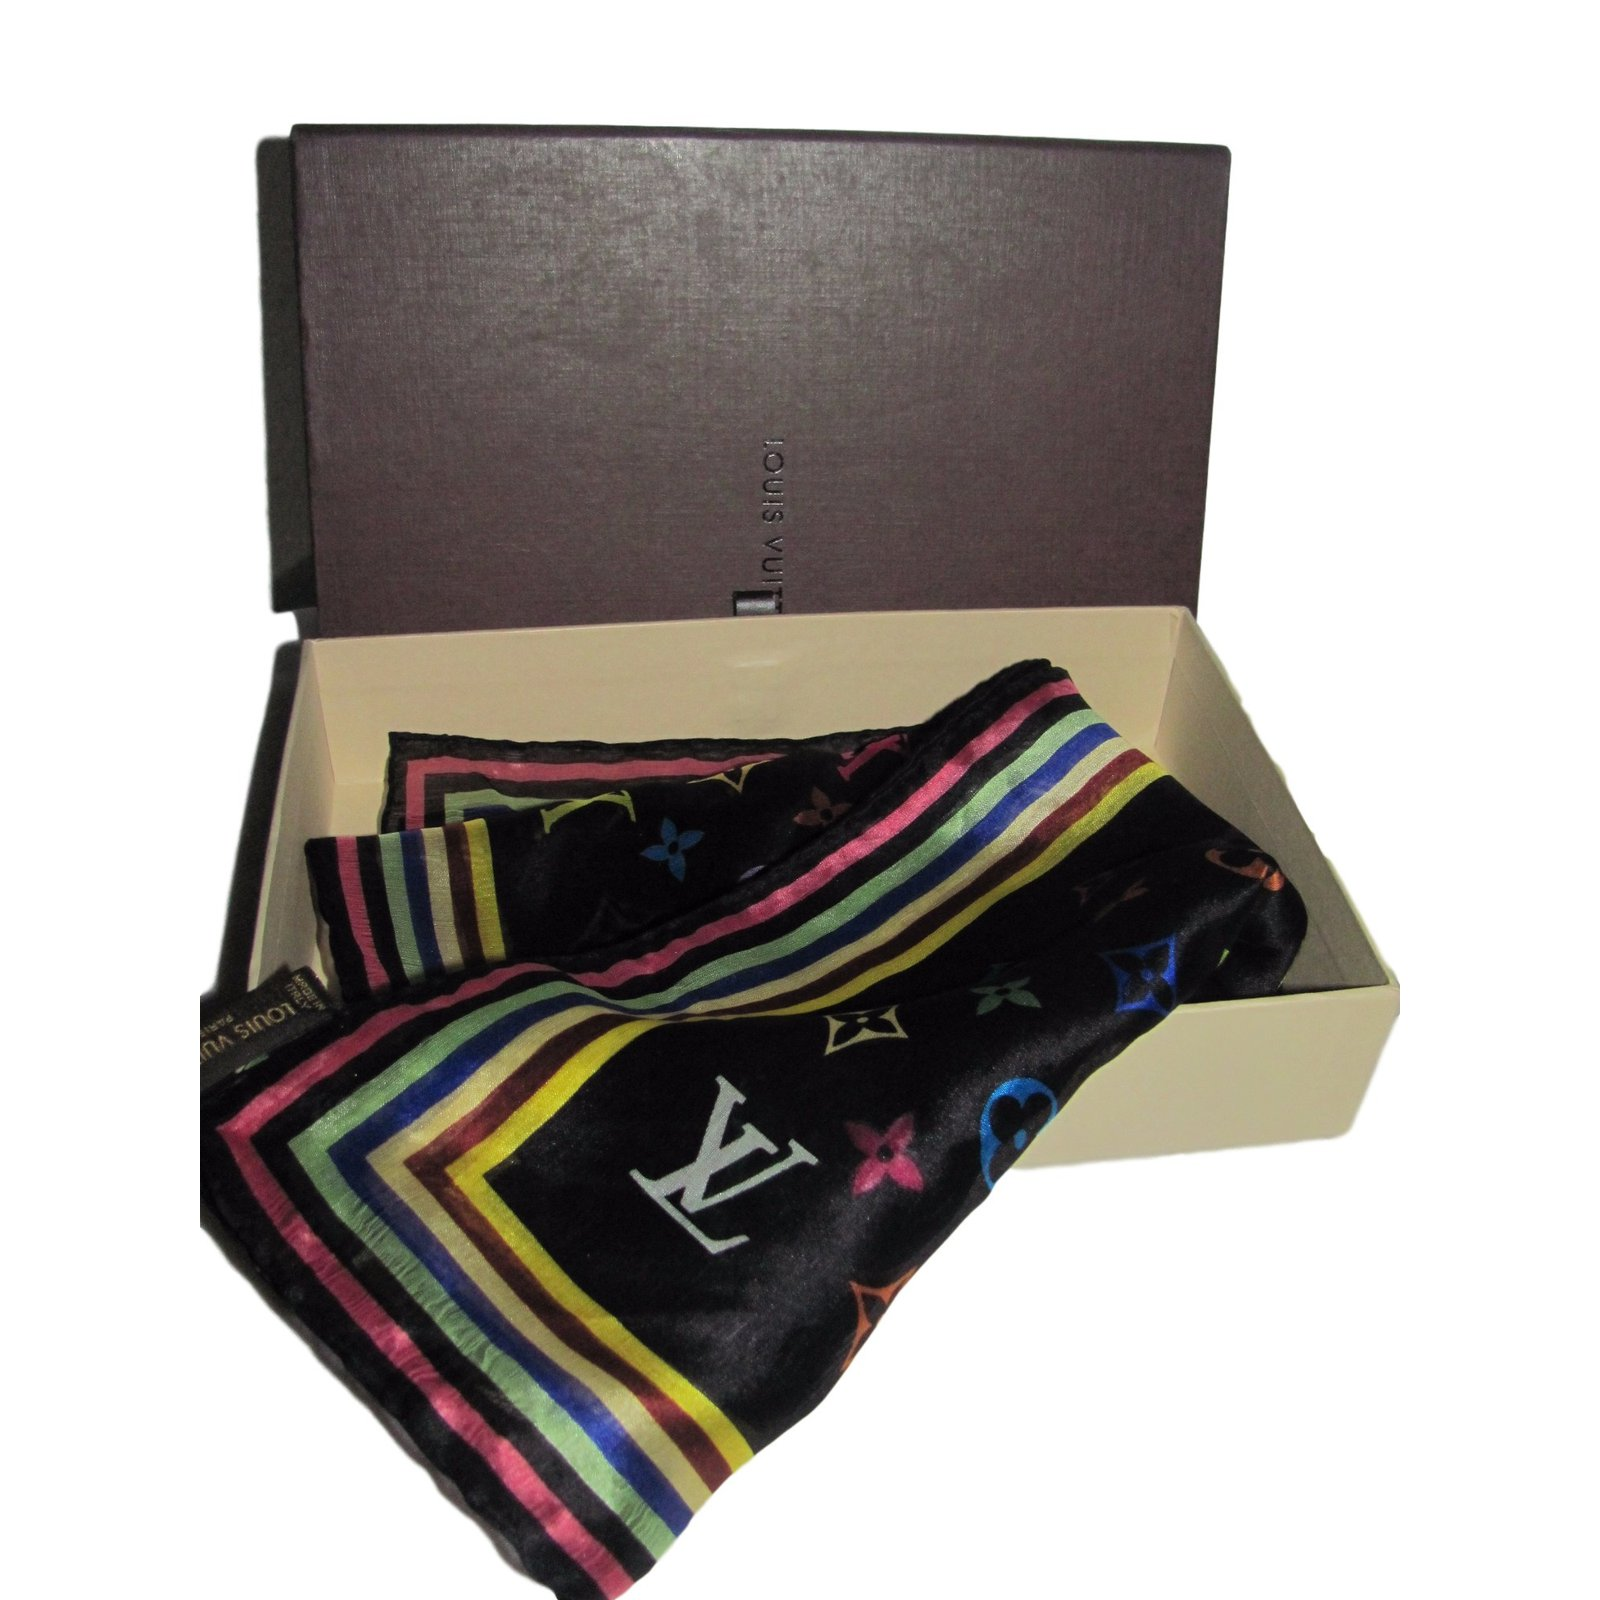 Foulards Louis Vuitton Foulard Soie Multicolore ref 23984 Joli Closet c03414e839e